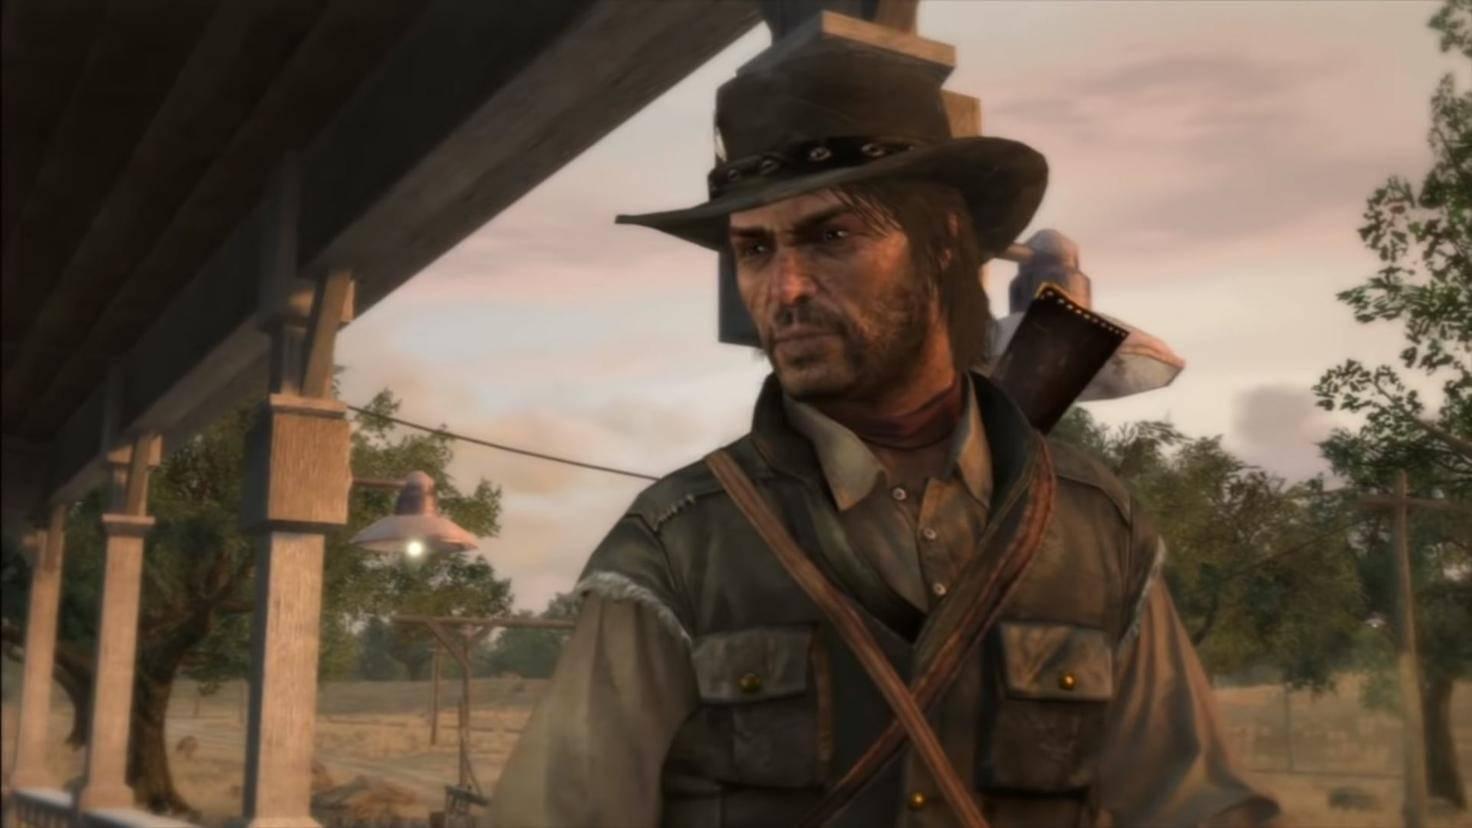 red-dead-redemption-john-marston-screenshot